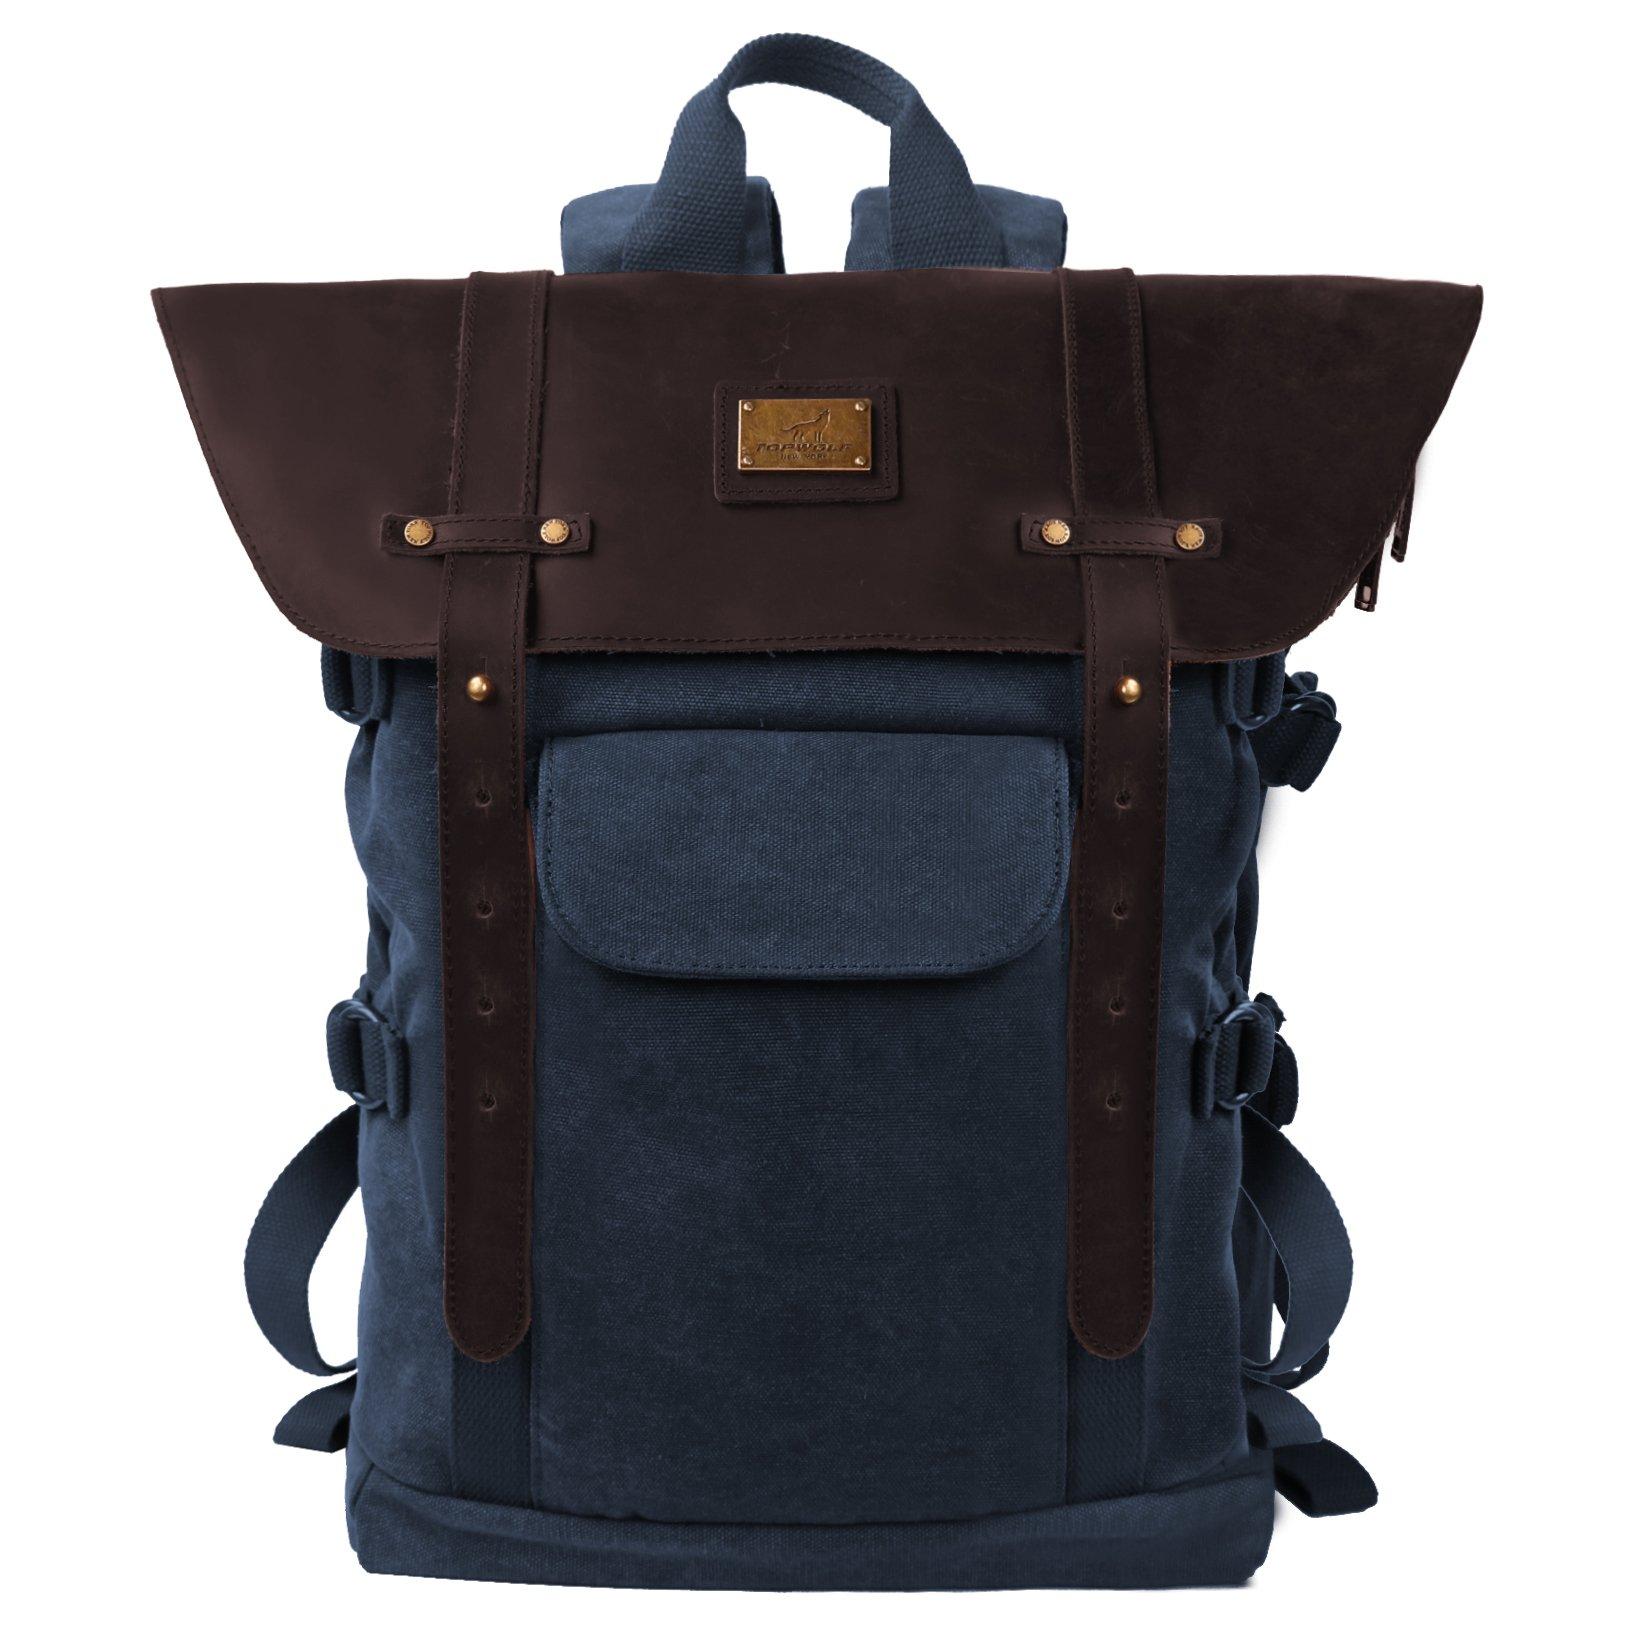 TOPWOLFS Vintage Backpack Leather Canvas Rucksack fit 15.6'' Laptop Genuine Leather Anti-theft Pocket Multifunction Books School Travel Bag